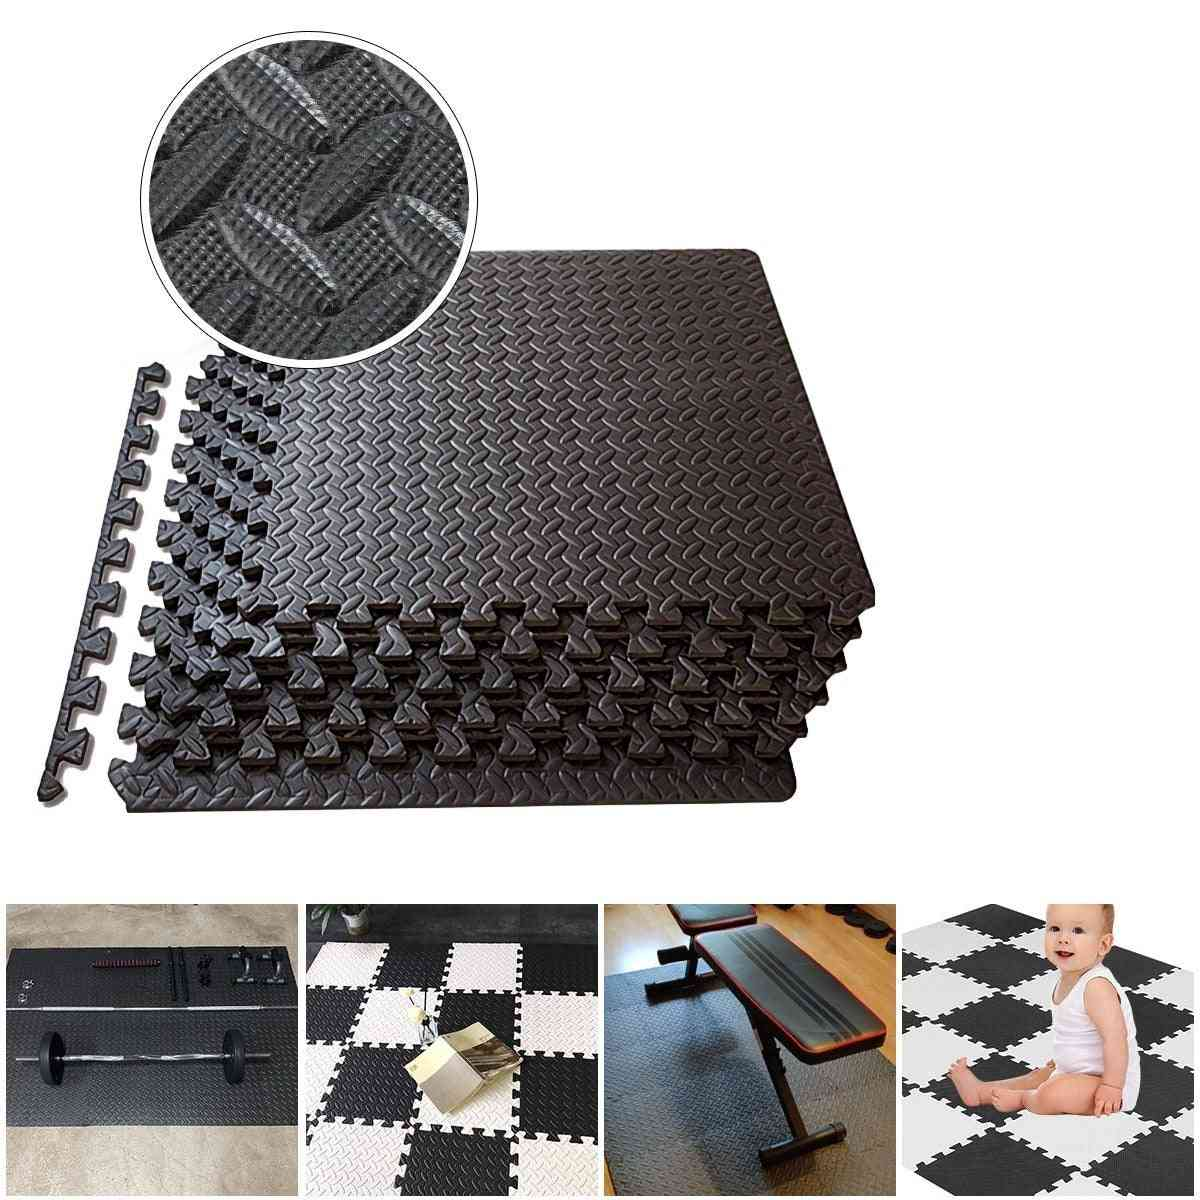 Interlocking Tiles Protective Flooring Eva Foam Mats